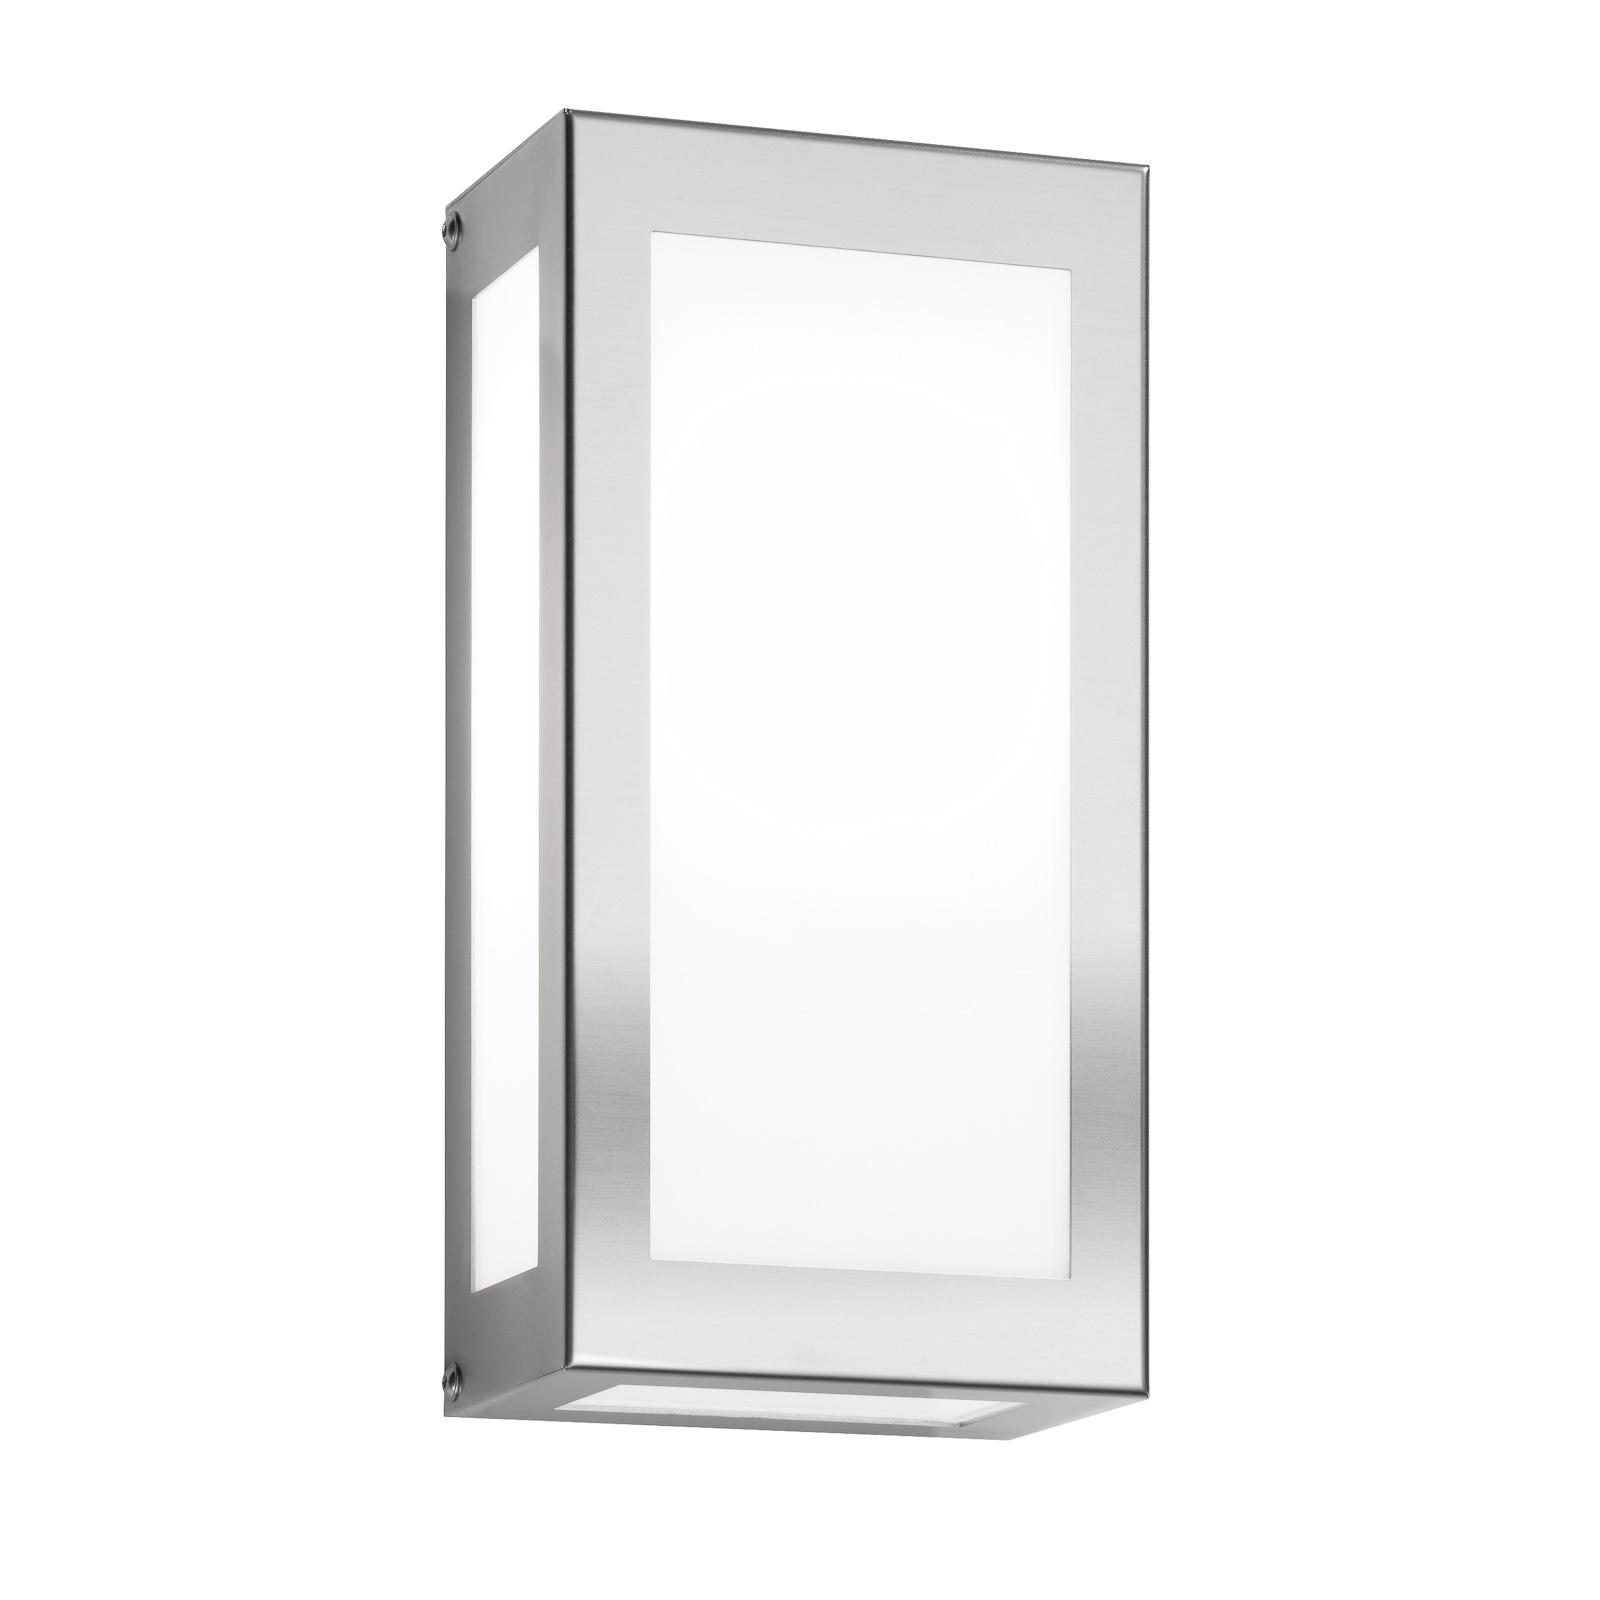 Kvádrové vonkajšie nástenné LED svietidlo Kina_2011220_1